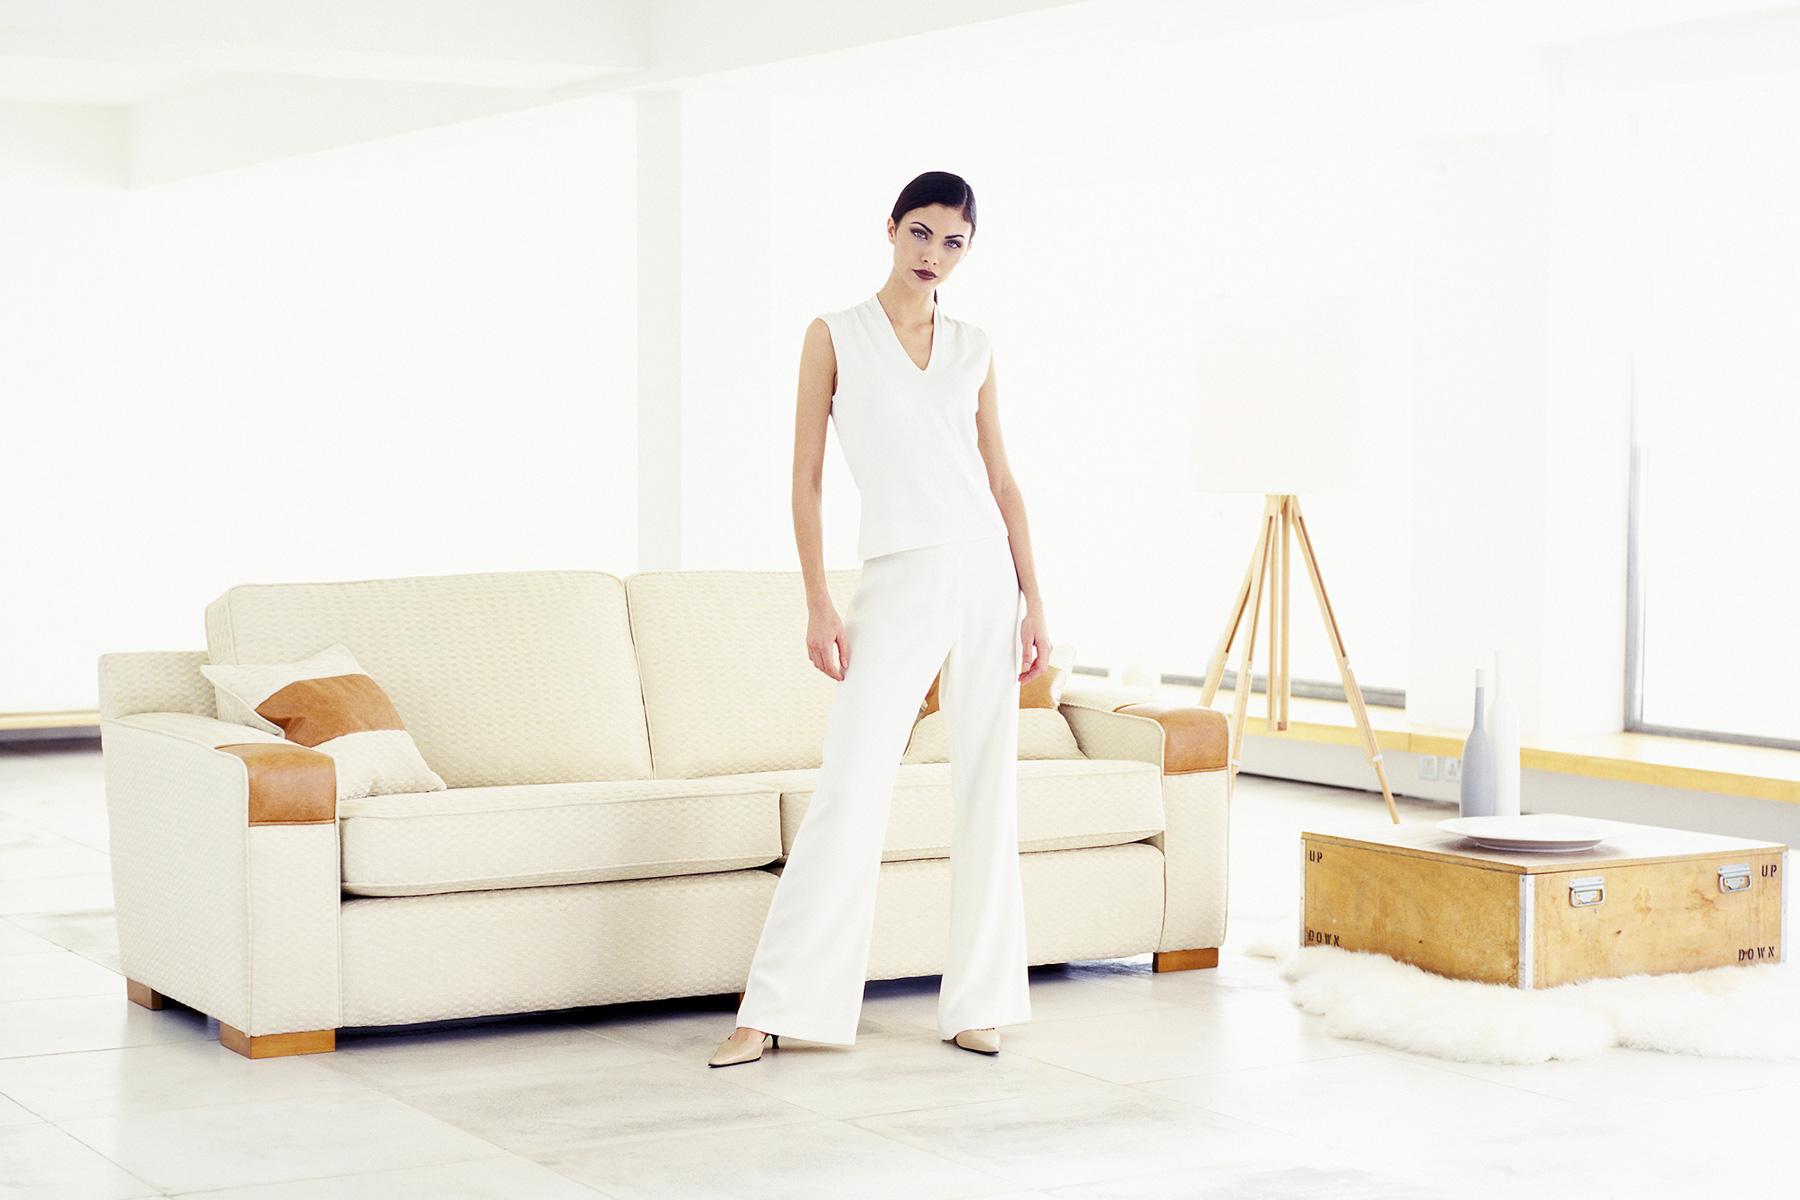 richard goulding fashion & lifestyle photographer_SQ_03.jpg